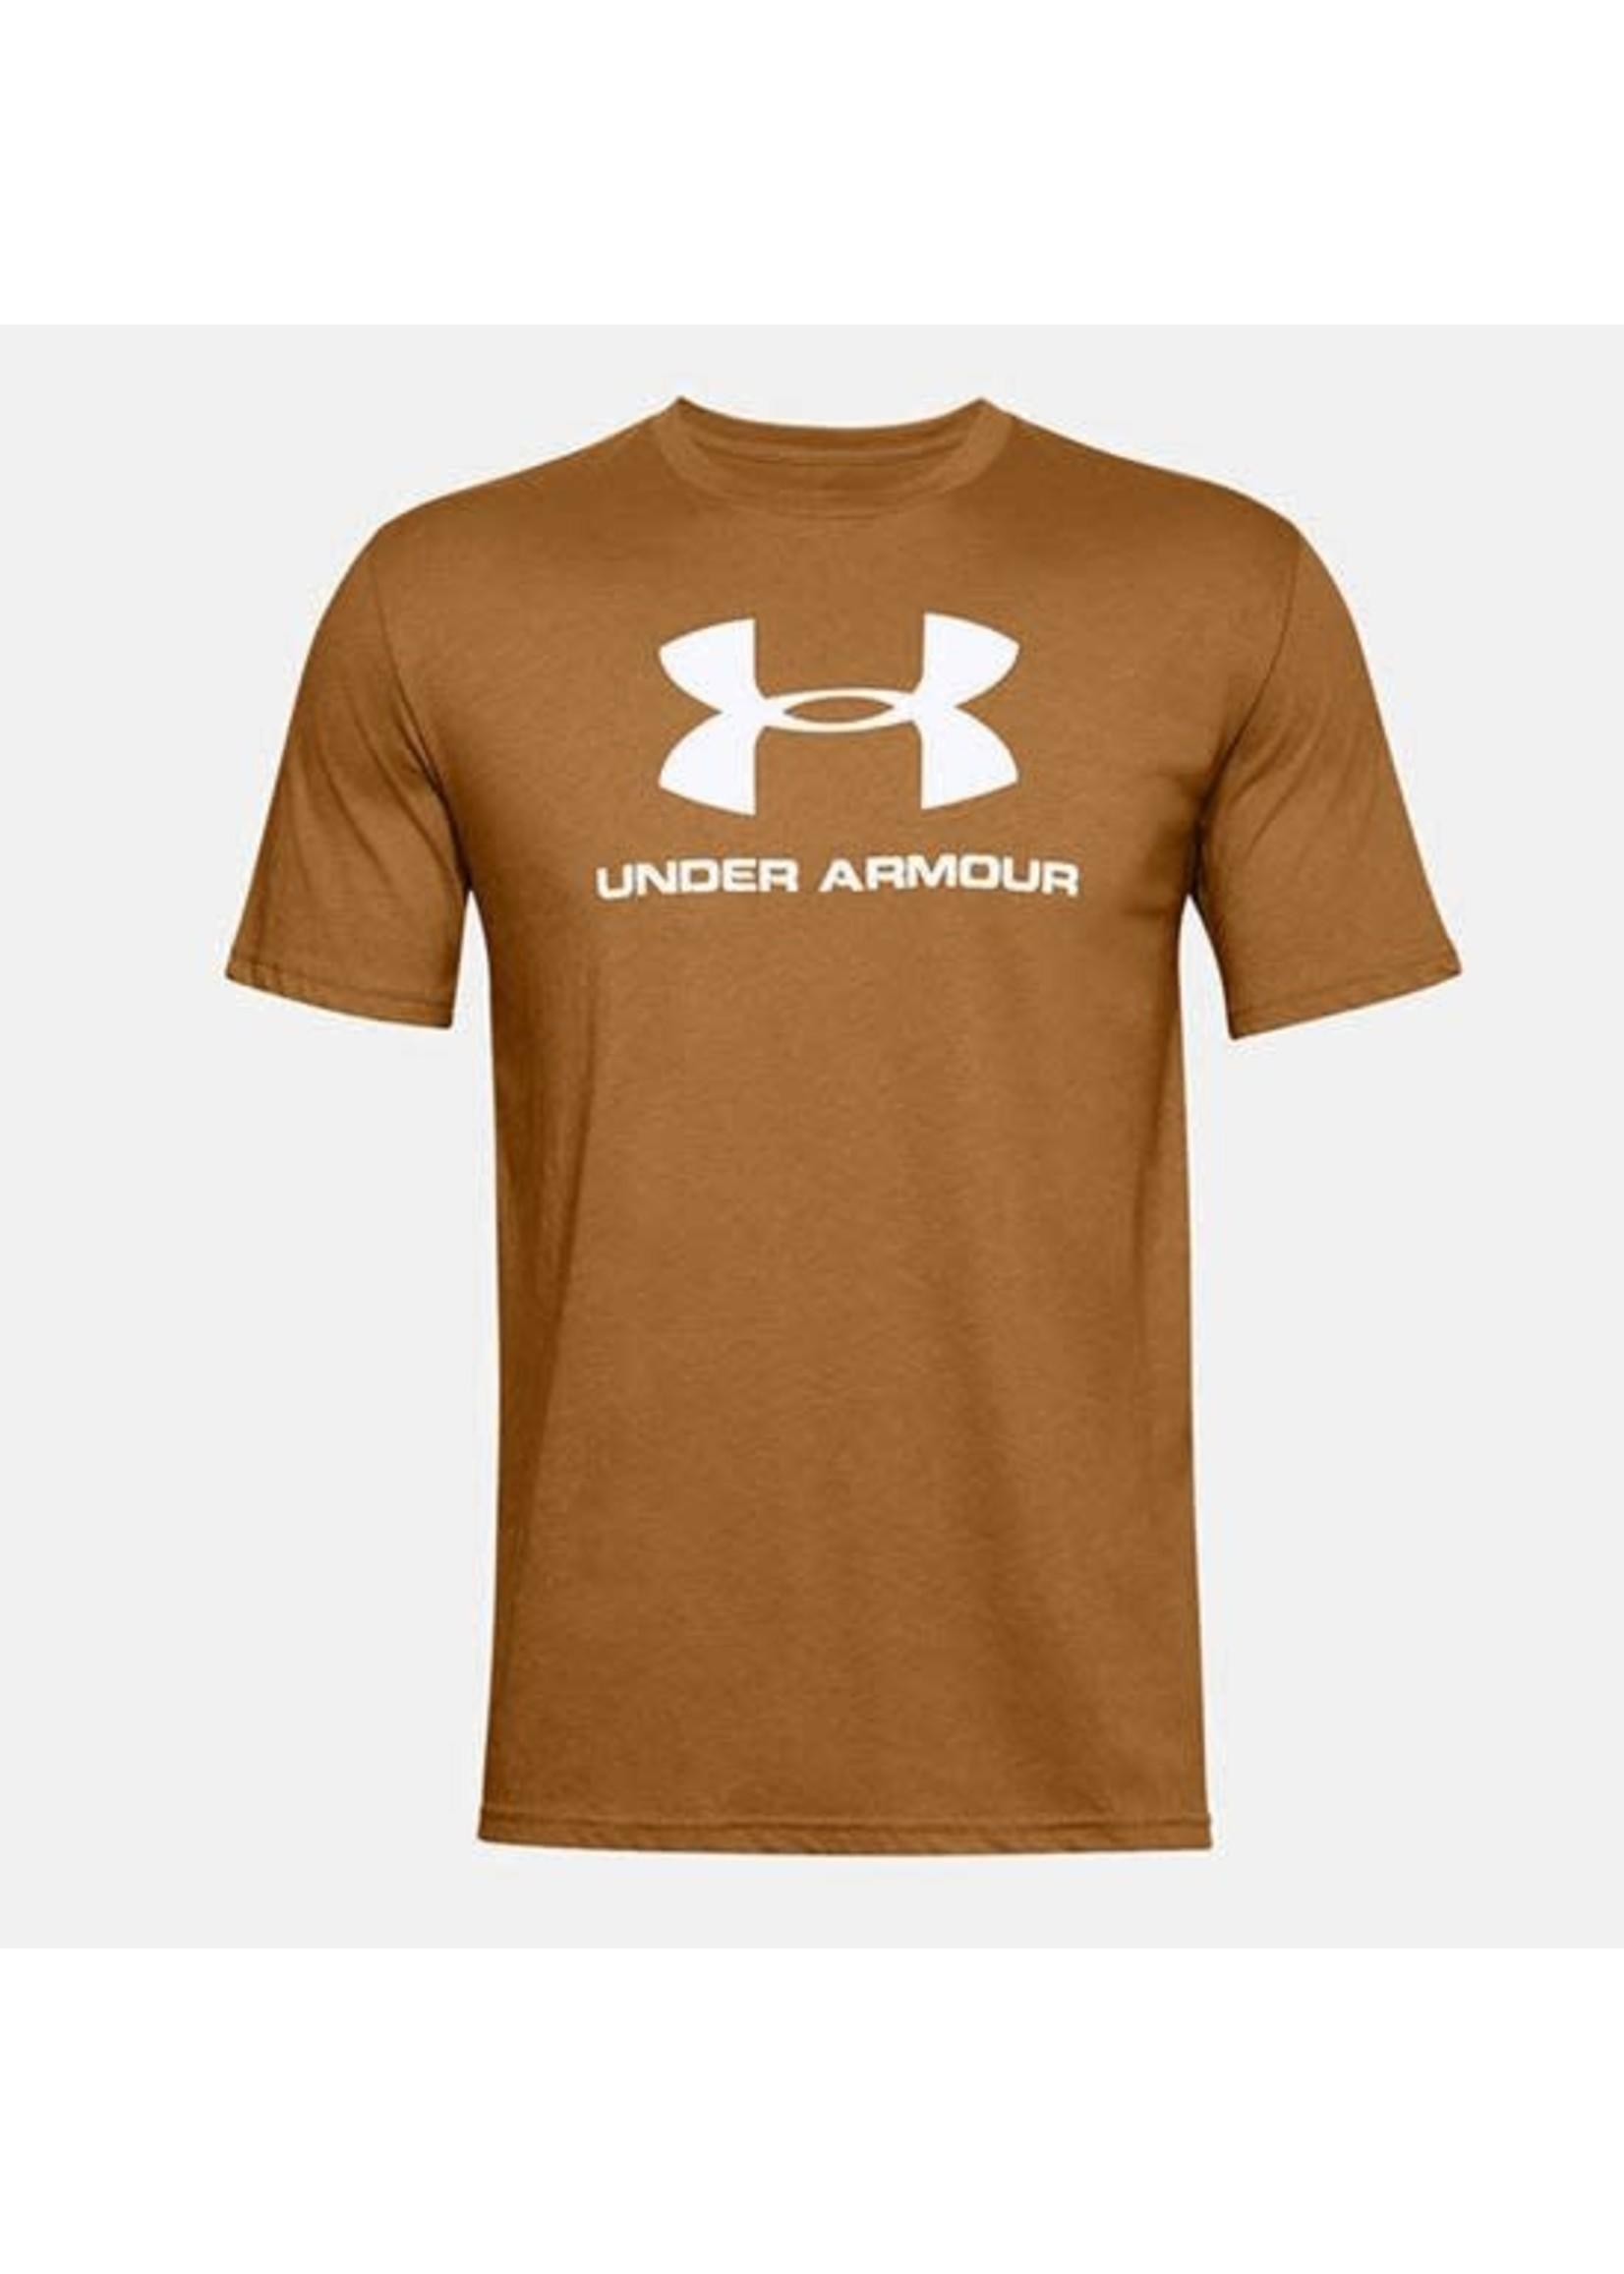 UNDER ARMOUR T-shirt Sportstyle / Medium / Jaune